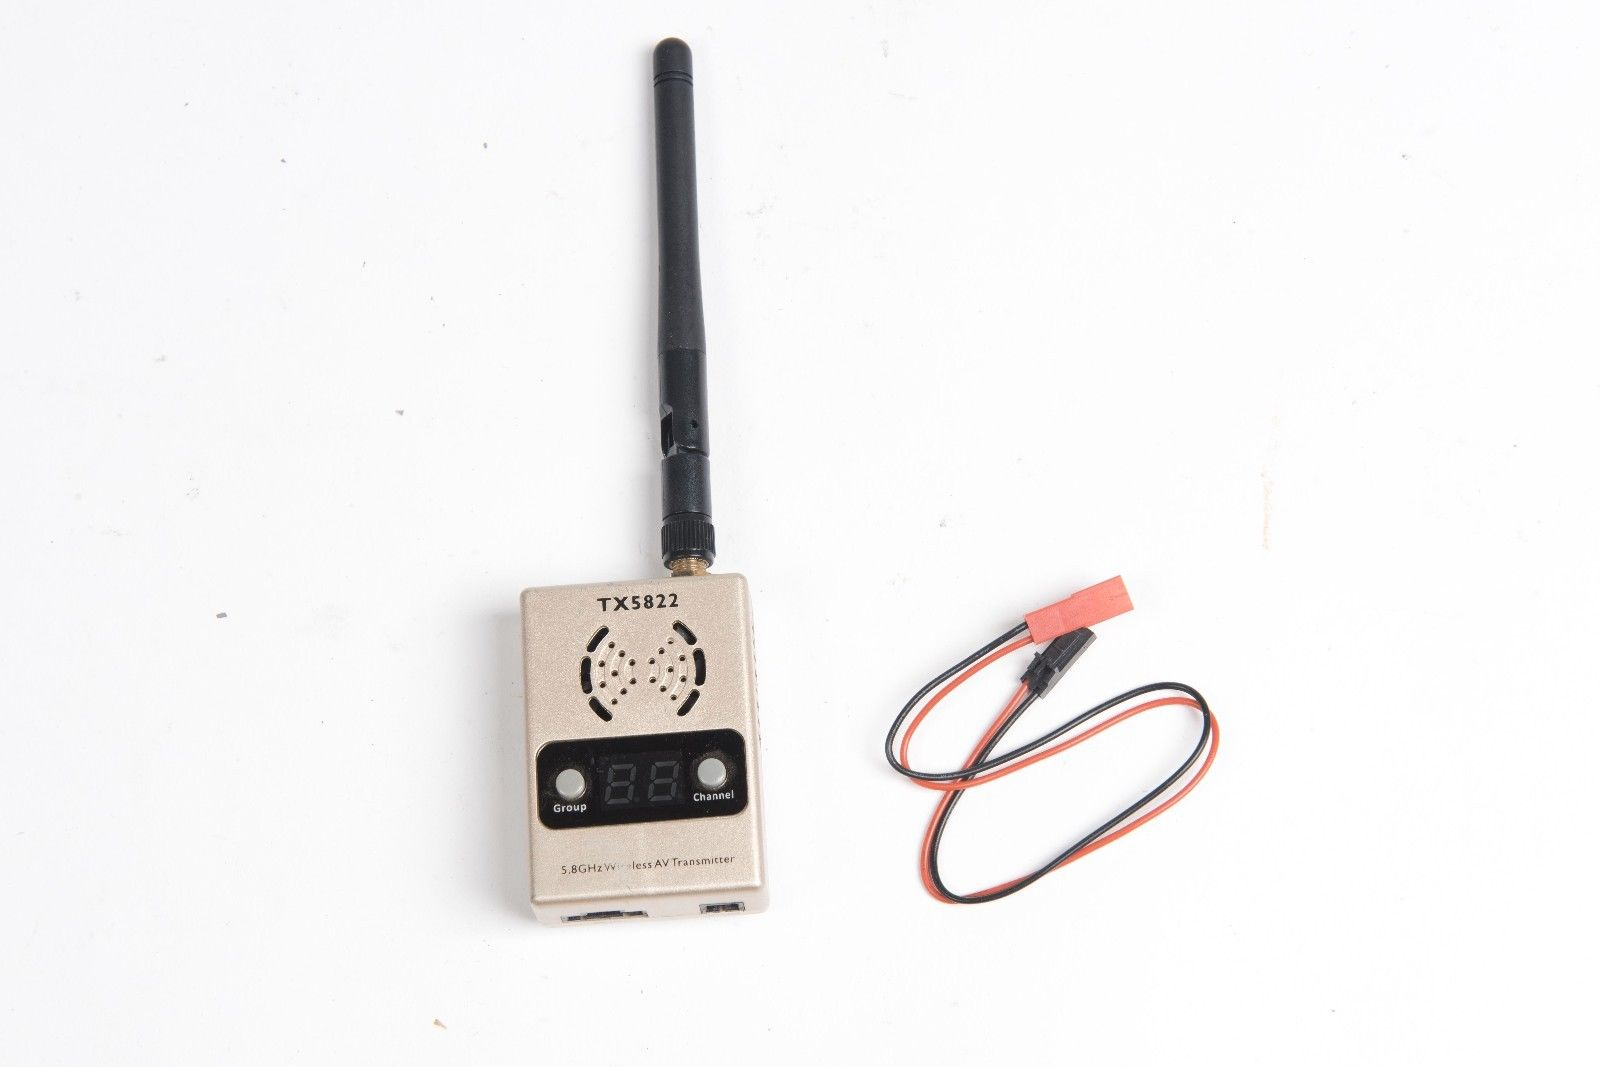 Boscam TX5822 5.8g 32Ch 2200mw FPV Wireless AV Tx Transmitter For FPV Drone RC Quadcopter fpv 1 2ghz 100mw 4ch wireless audio